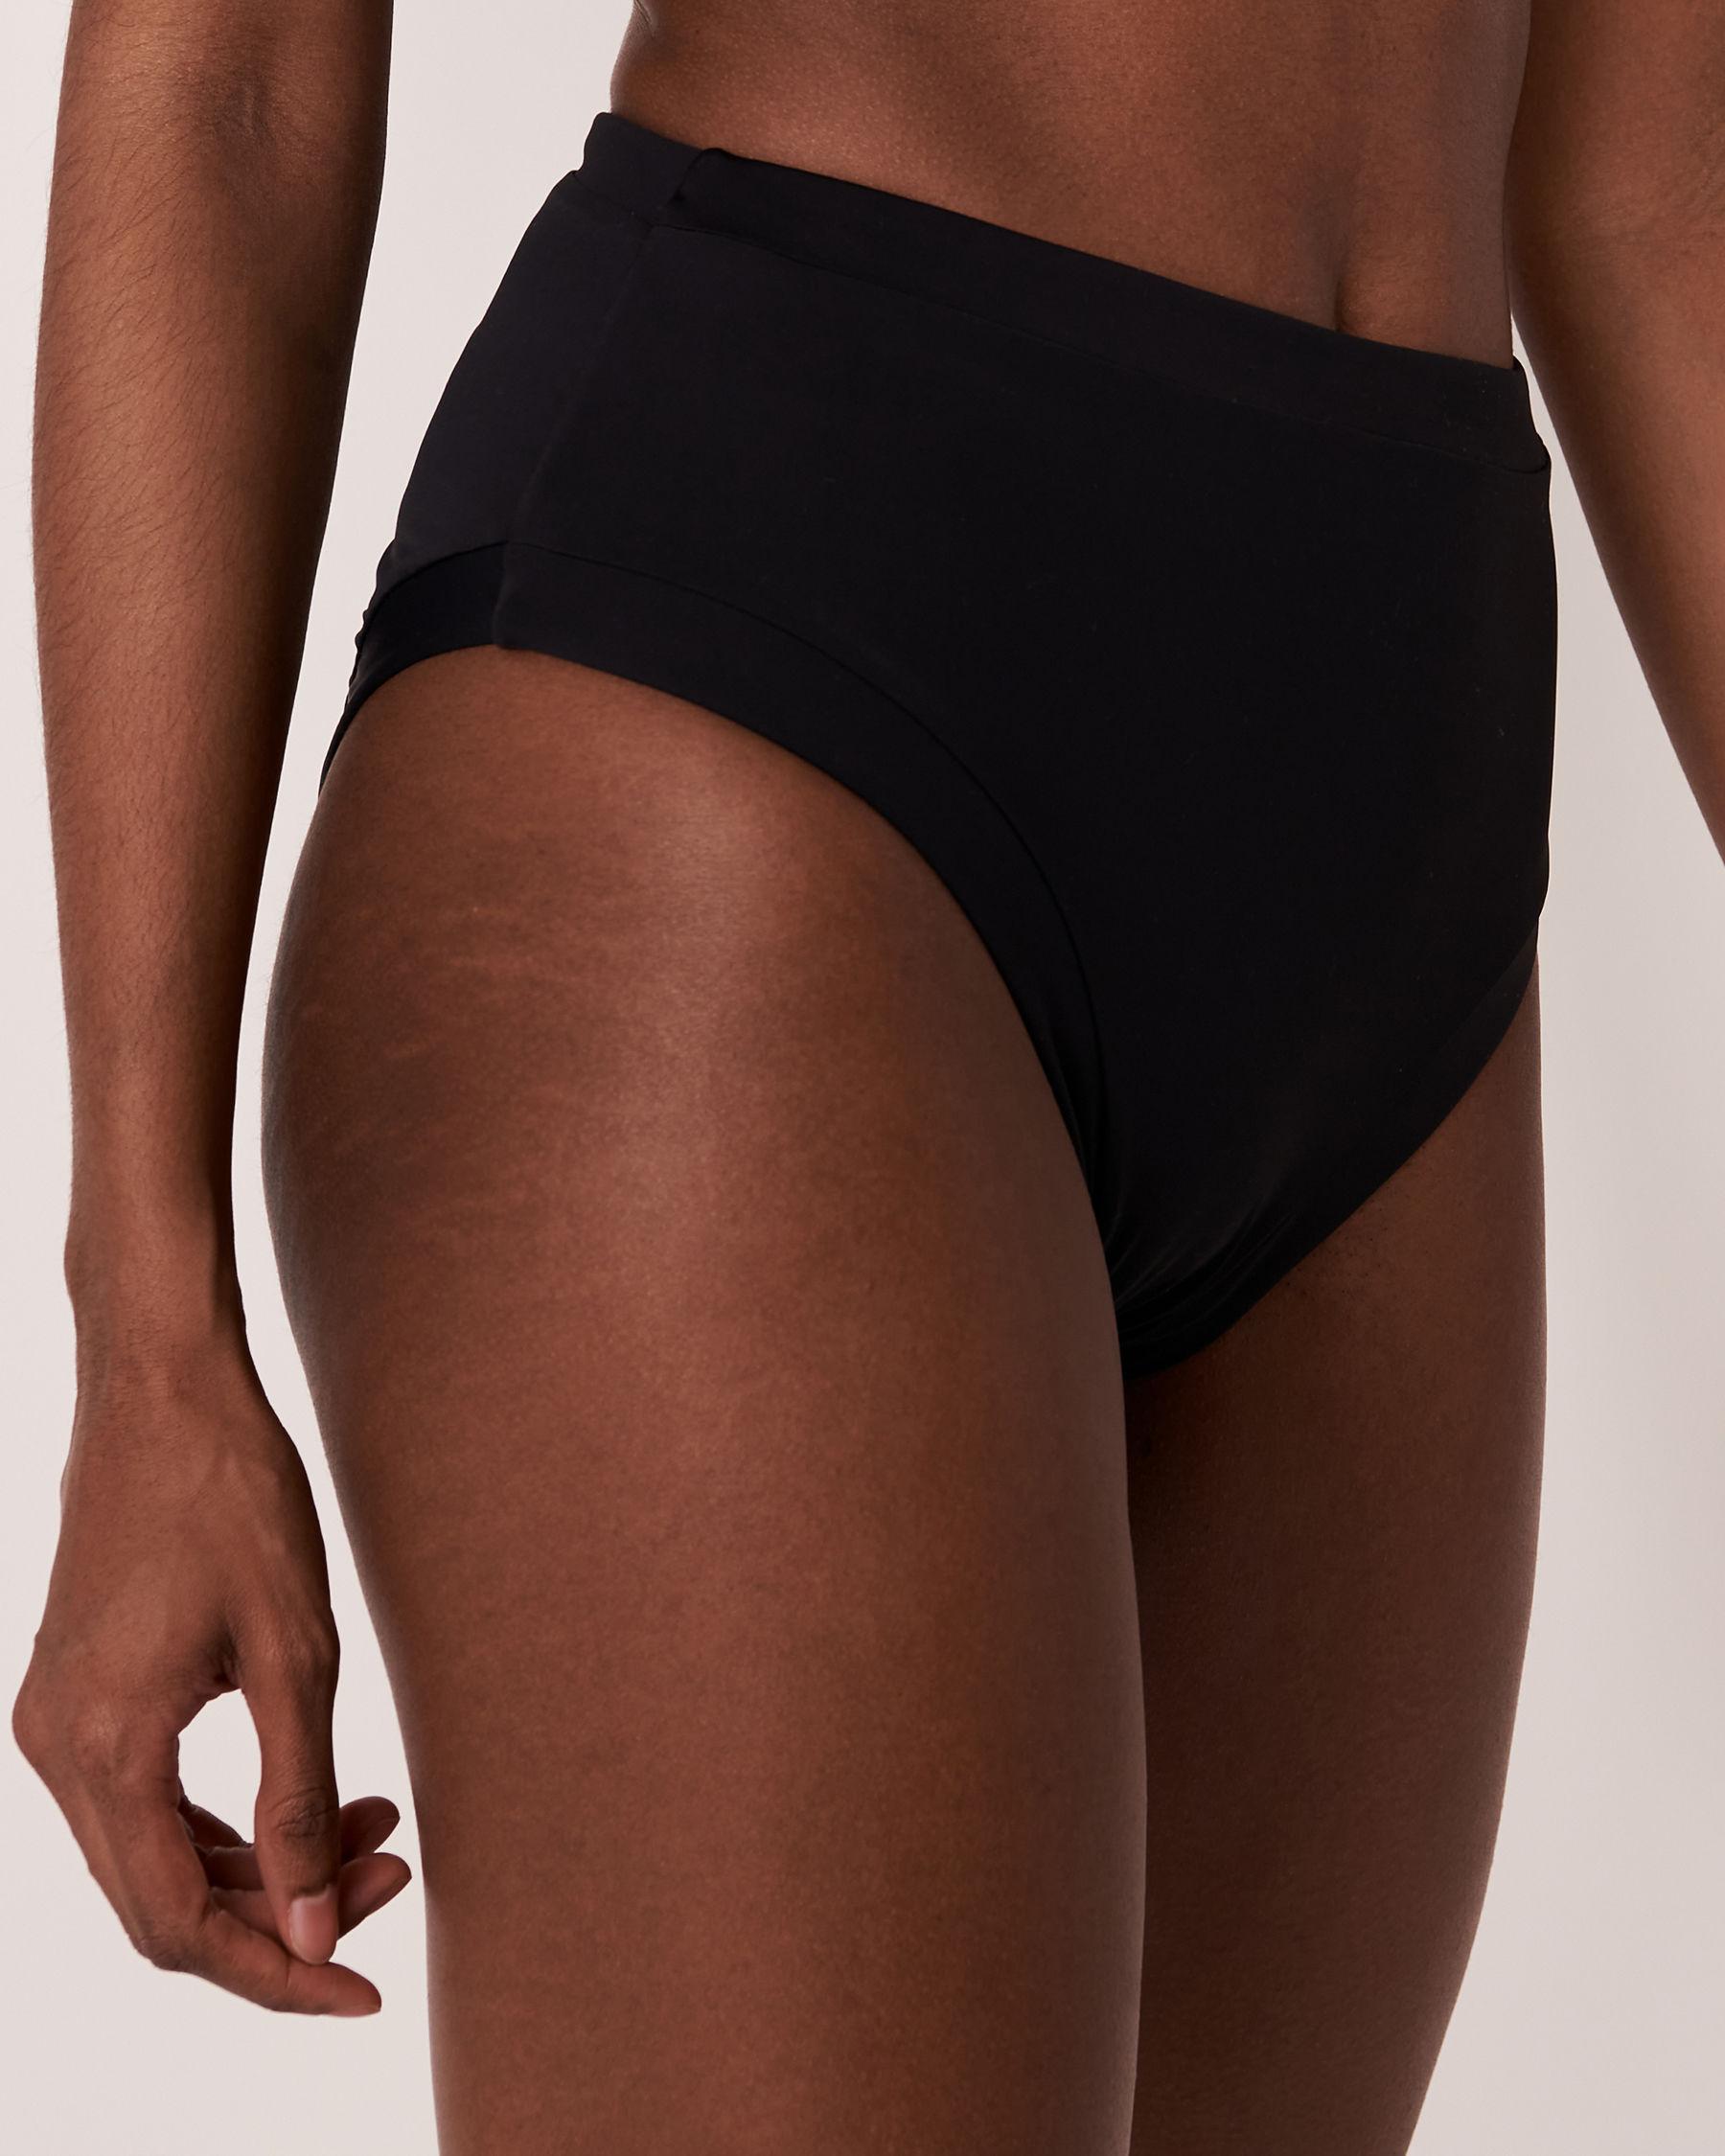 LA VIE EN ROSE AQUA SOLID High Waist Bikini Bottom Black 70300105 - View1